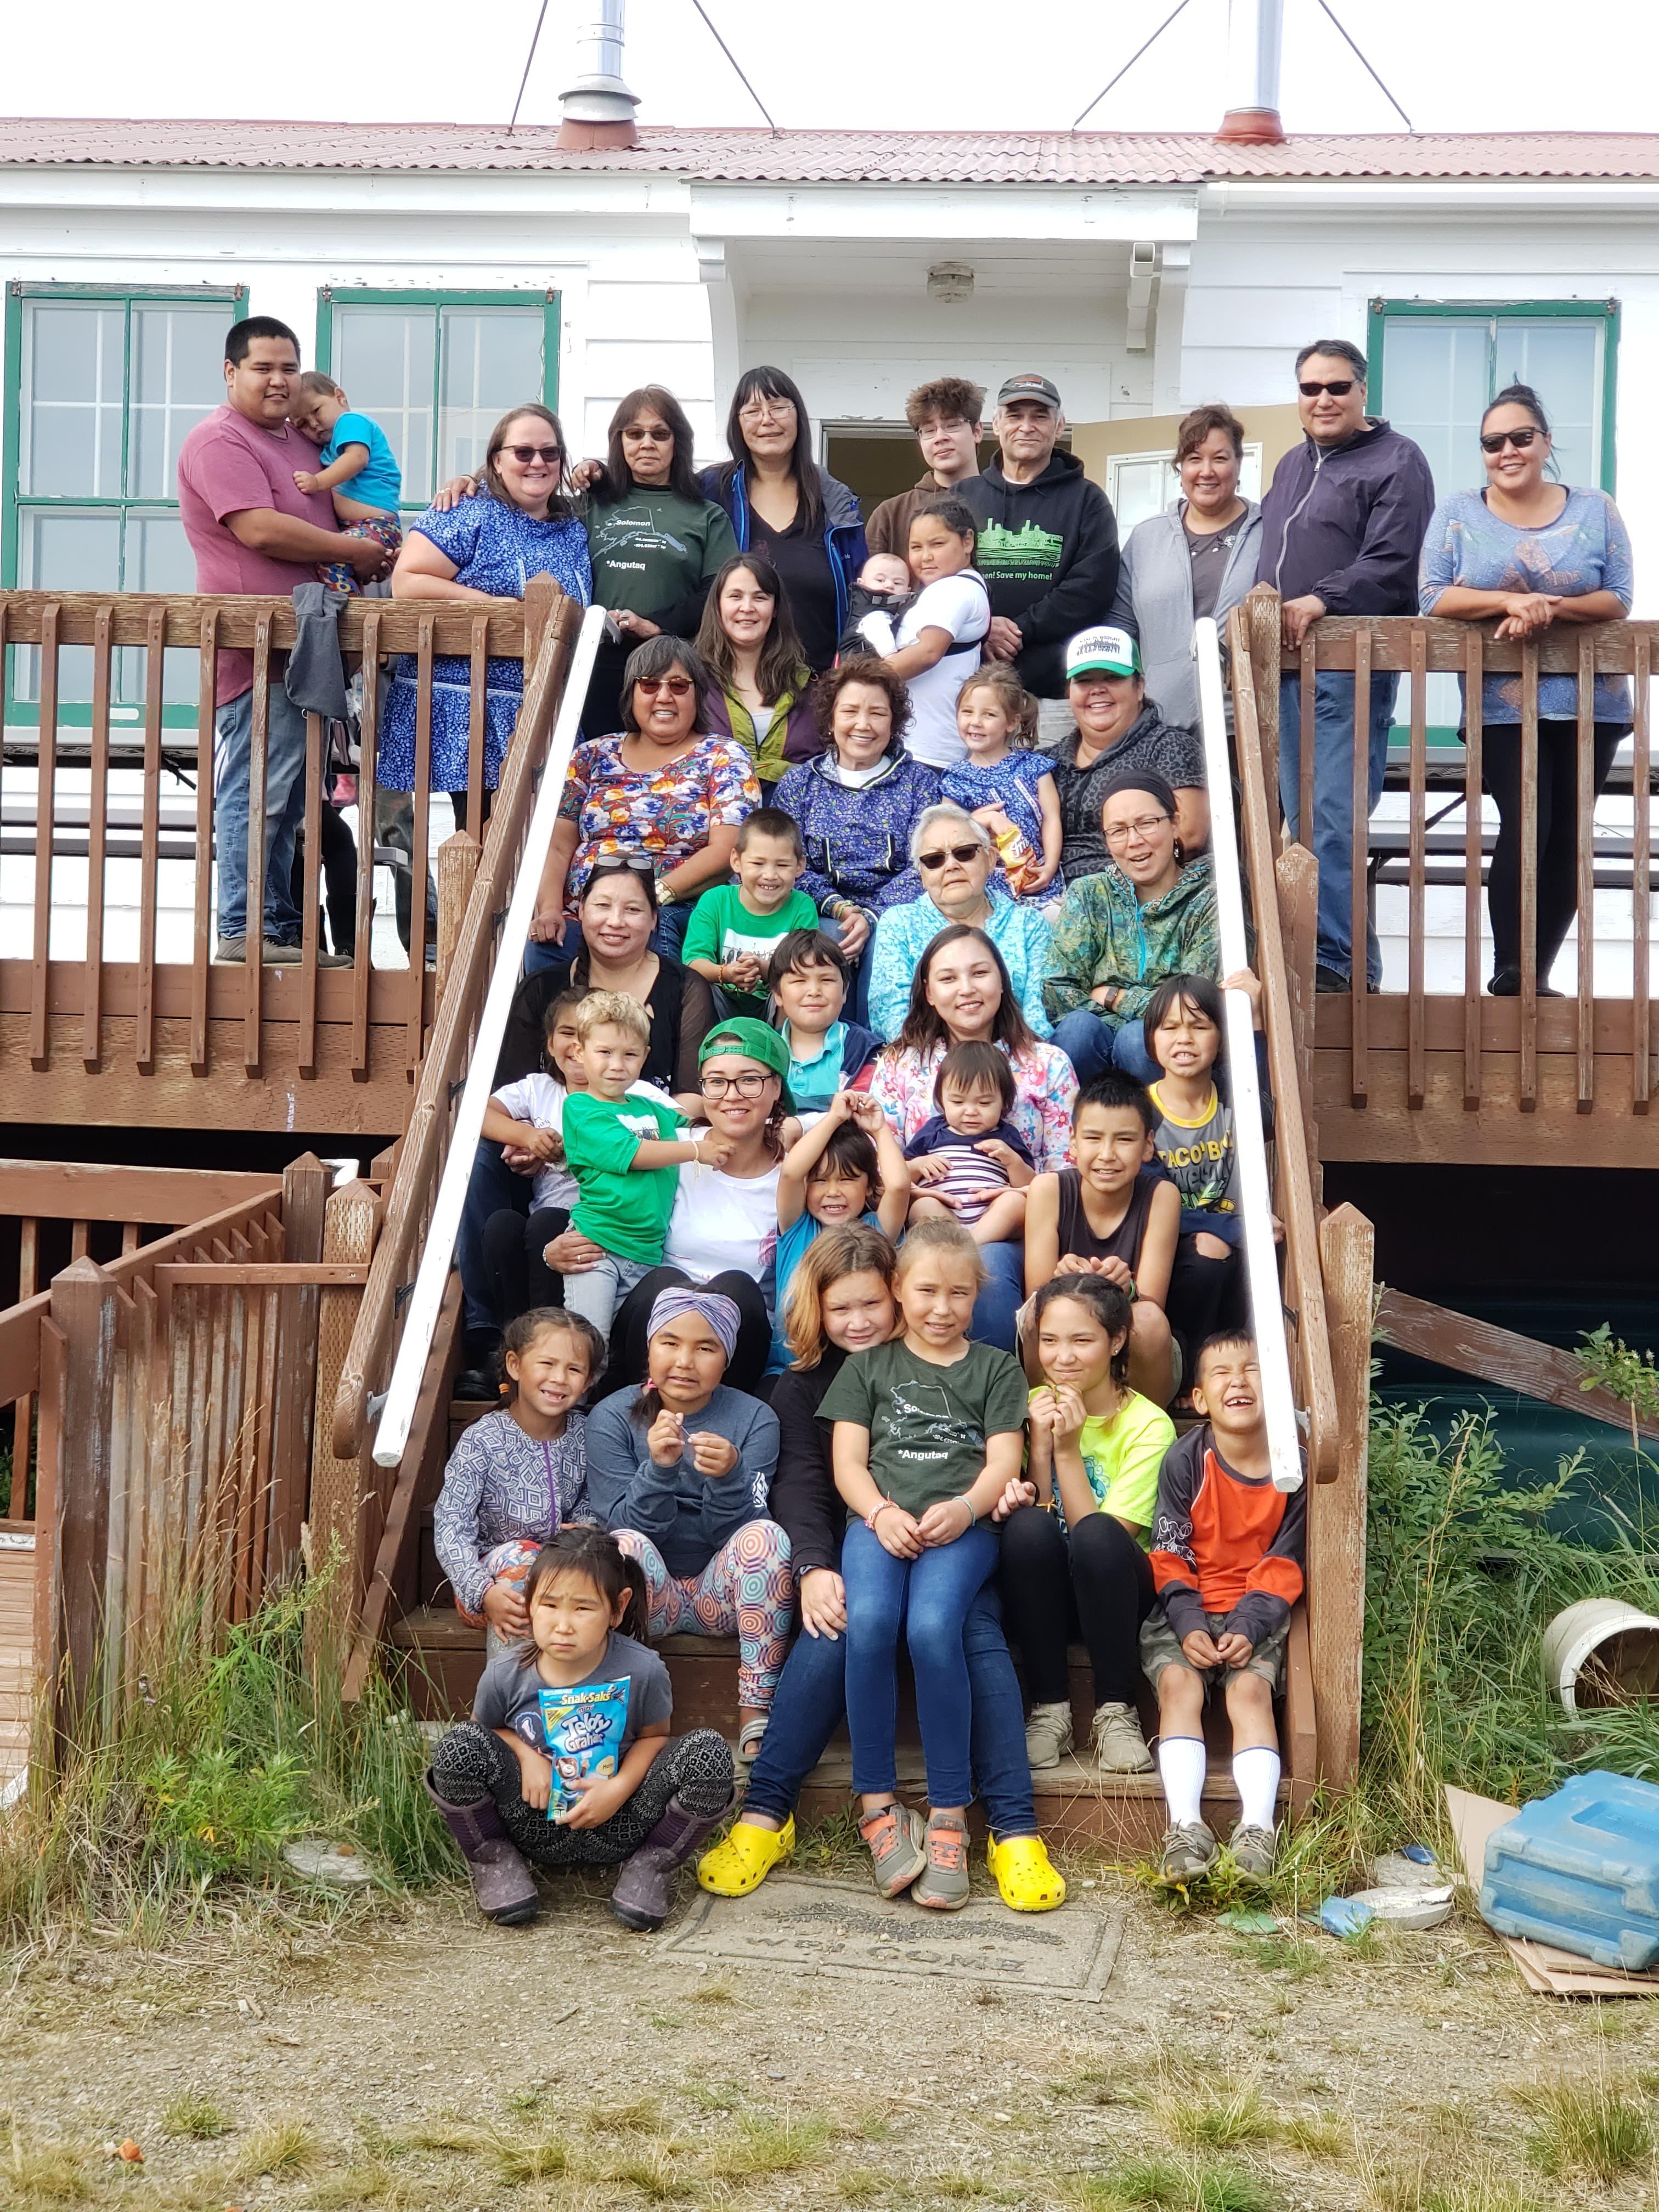 2019 Camp/Annual Meeting Photo